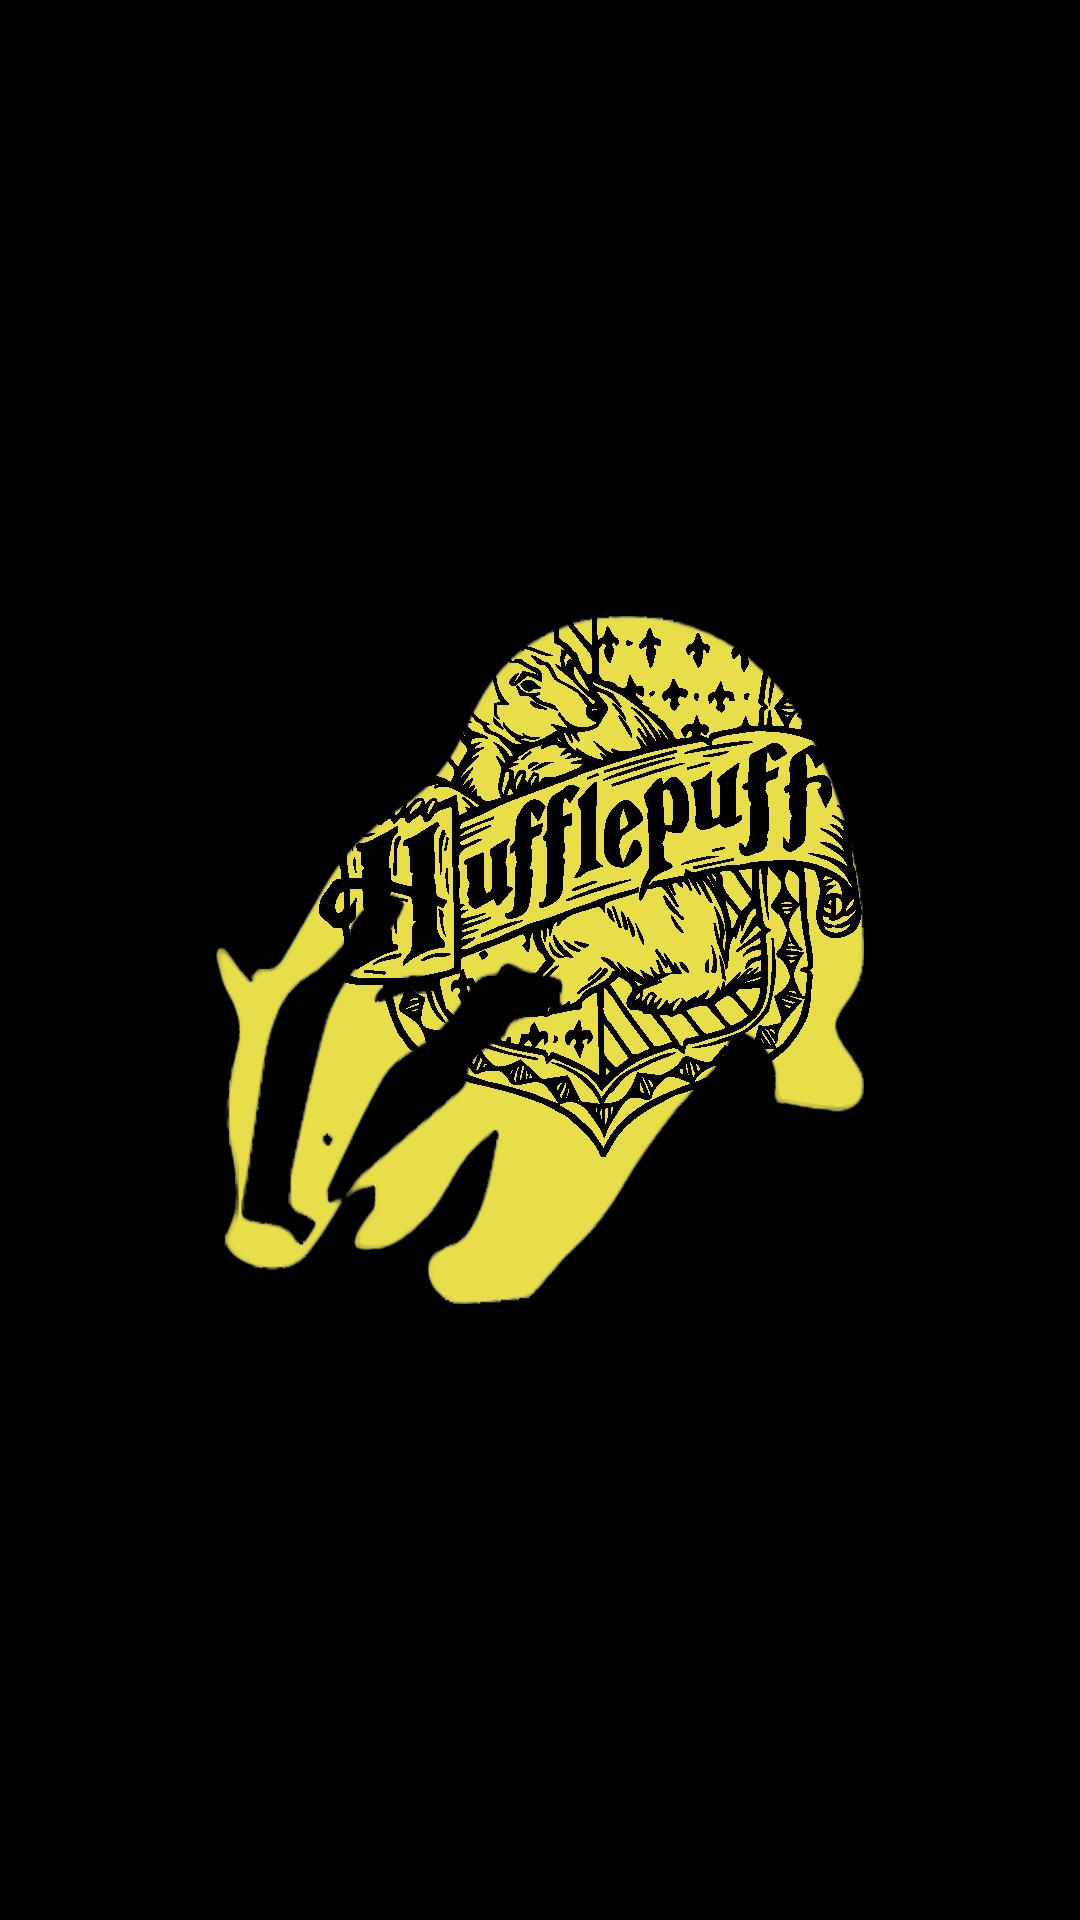 Harry potter stuff · ♡@Gracexaddisonଘ(੭ˊ꒳ˋ)੭✧ ♡. Iphone BackgroundsIphone  WallpapersWallpaper IdeasPhonesHufflepuff …